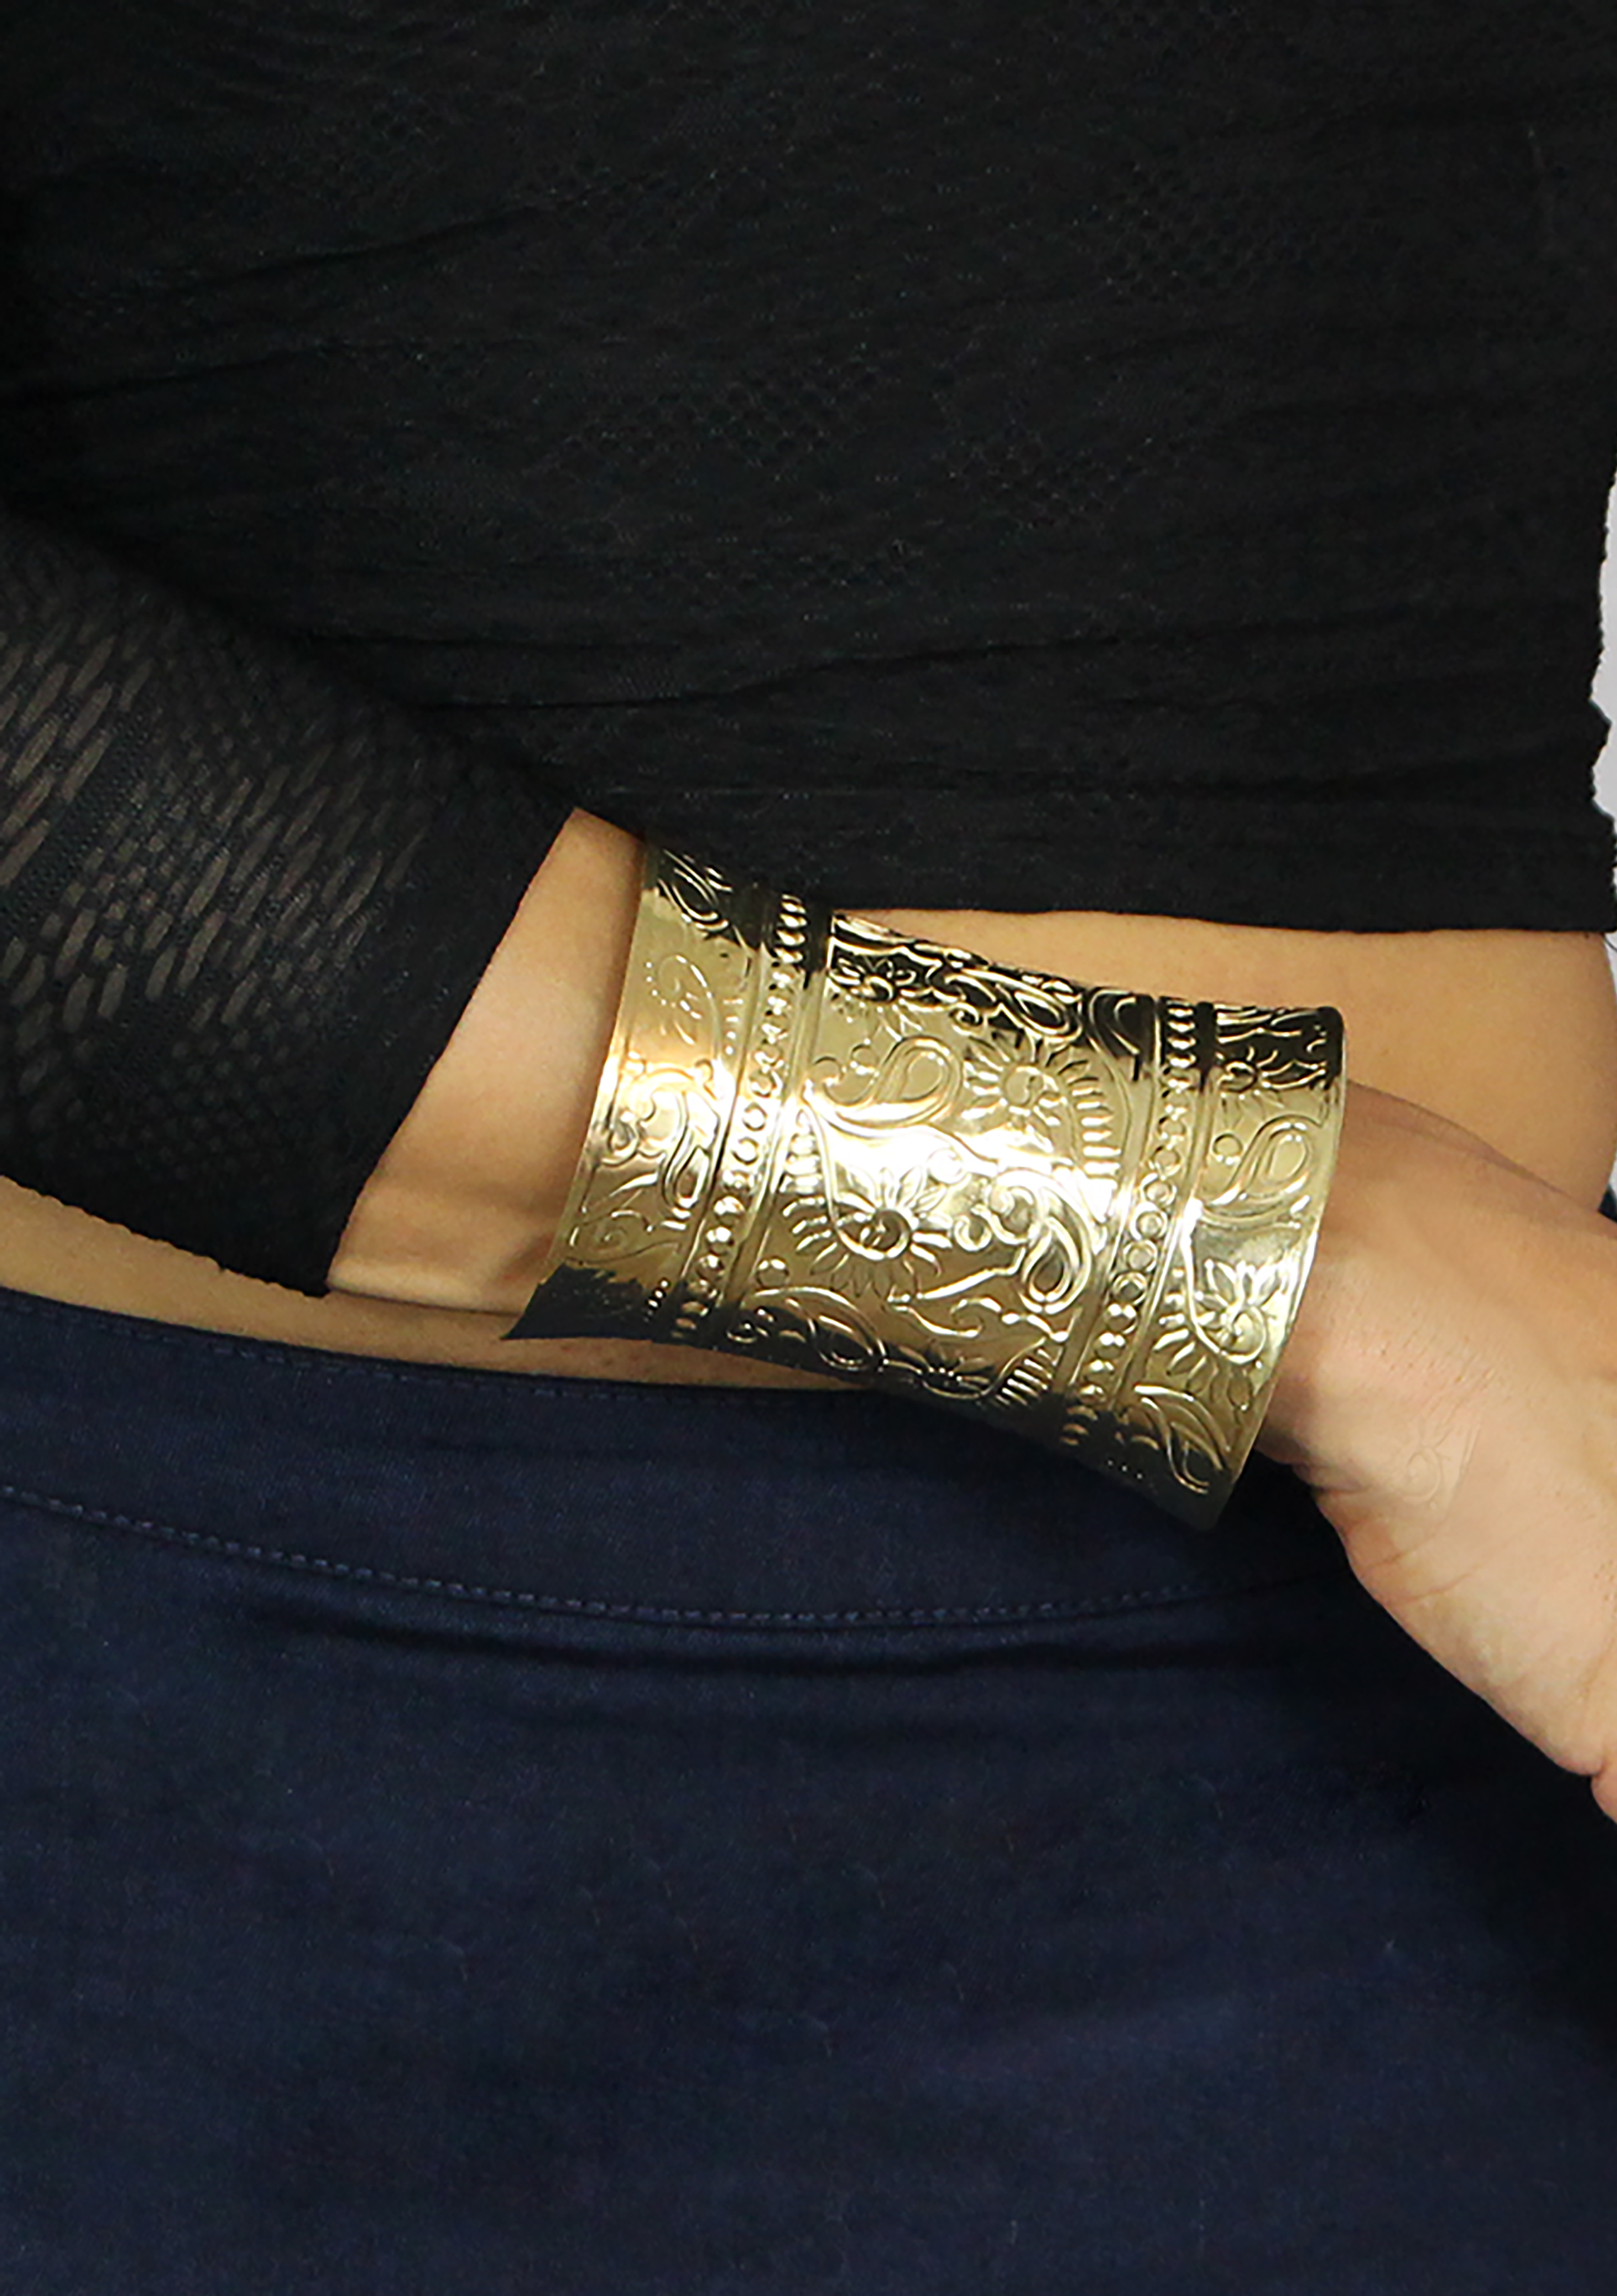 5406dd88a6f ... Bracelet Bracelets For Women. Gold Cuff Bracelet Etsy -> Source. Gold  20vine 20egyptian 20cuff 20bracelet 20djbj106 201 Original